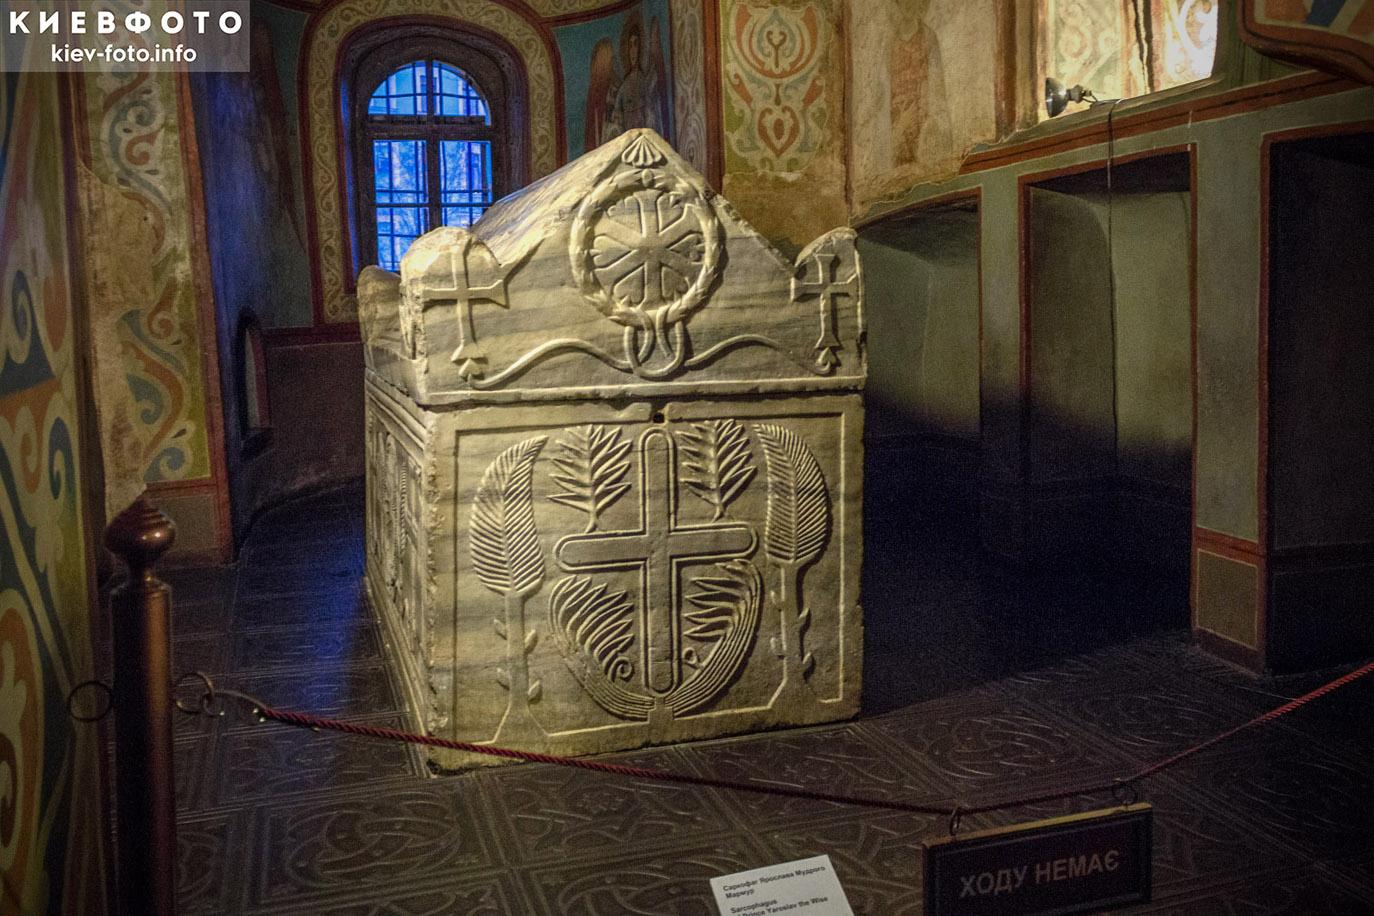 Мраморный саркофаг князя Ярослава Мудрого